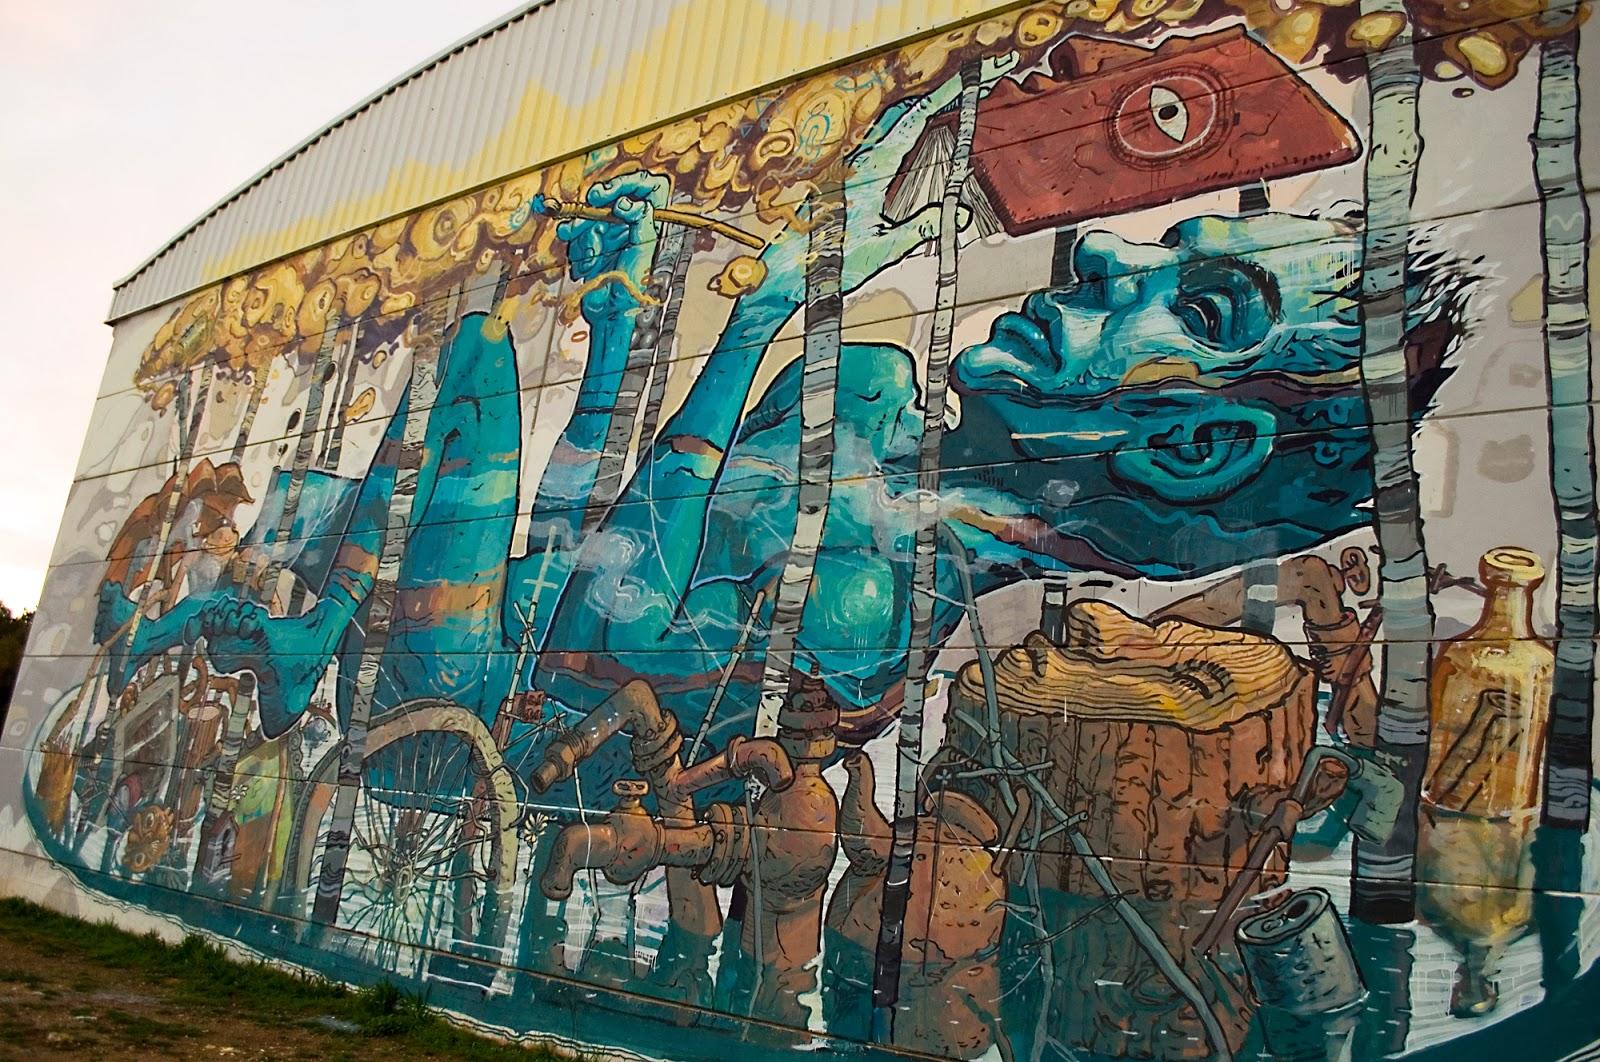 Riquiño-new-mural-at-desordes-creativas-2013-05